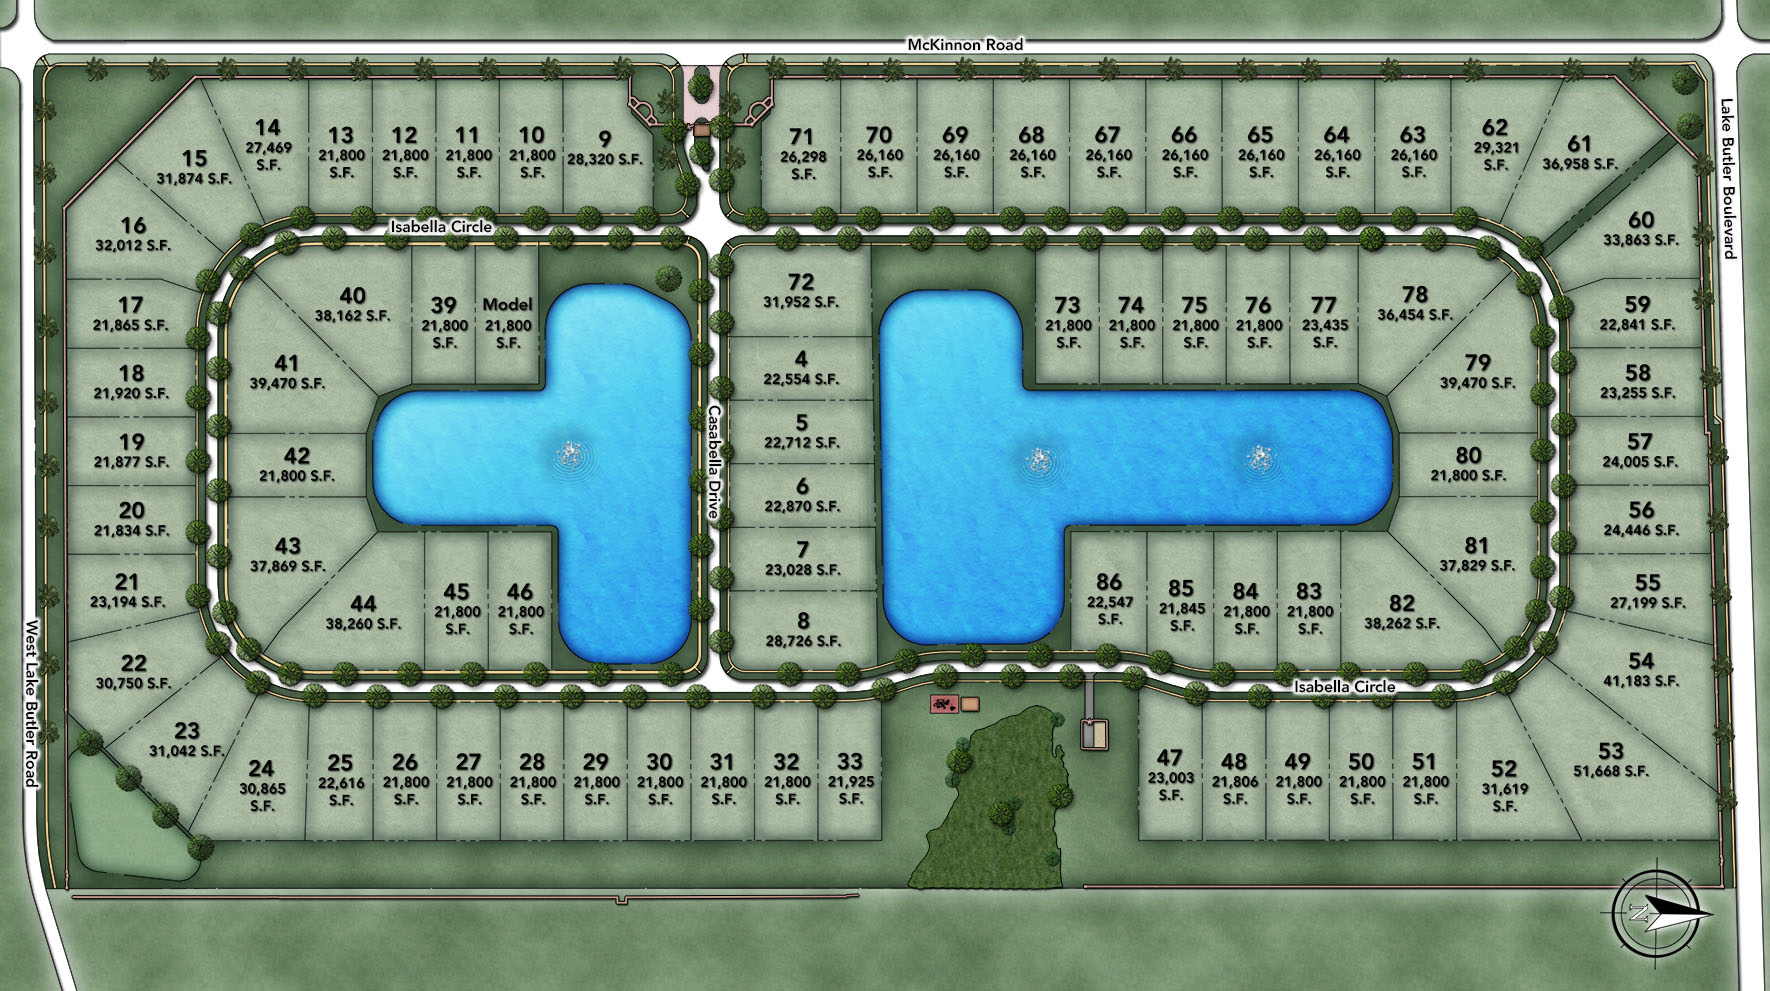 Casabella at Windermere Site Plan